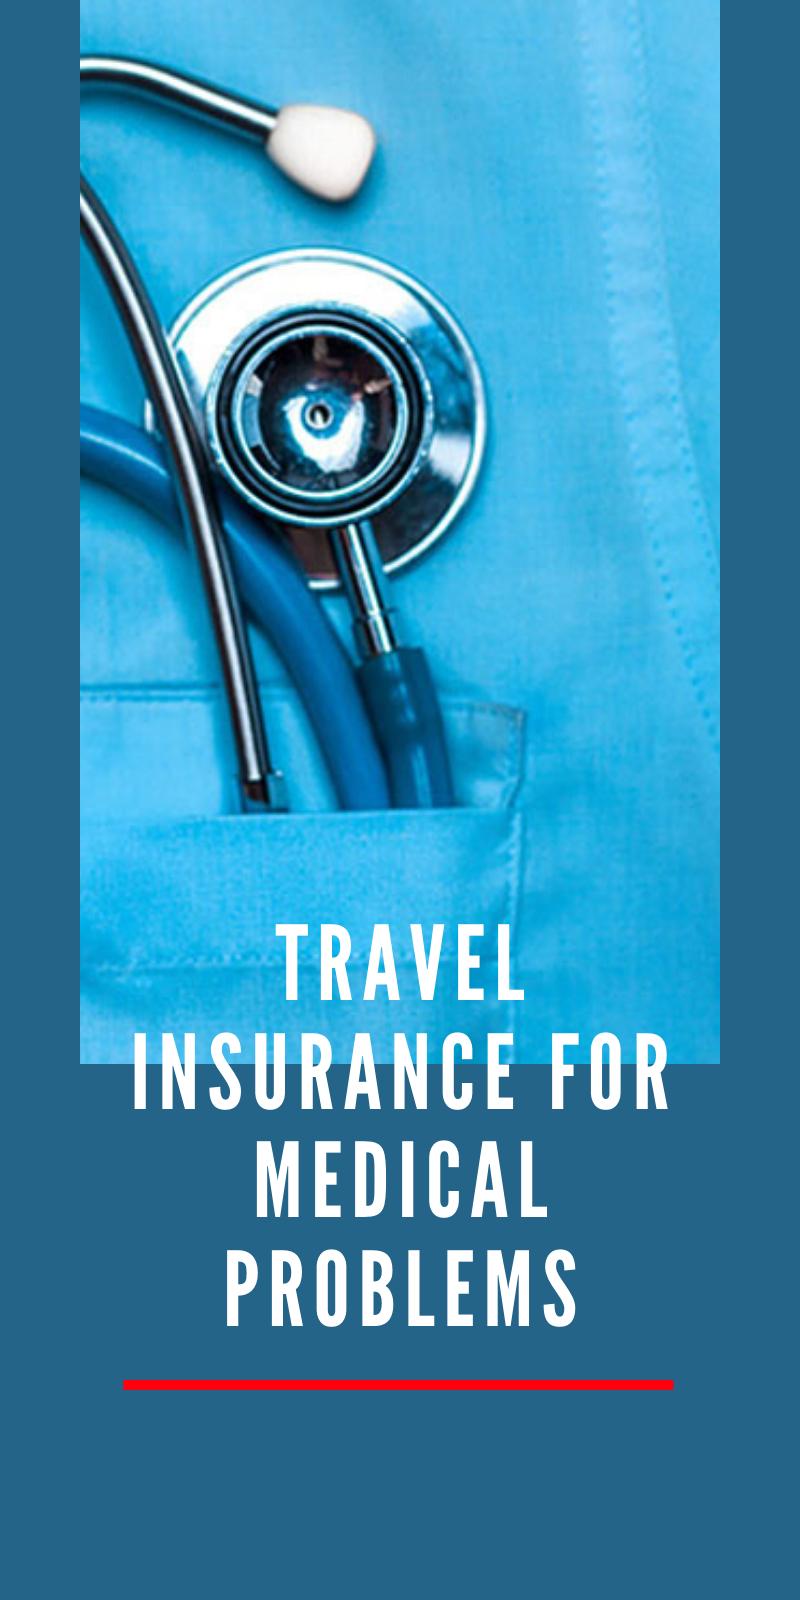 Travel Insurance For Medical Problems Our Deer Medical